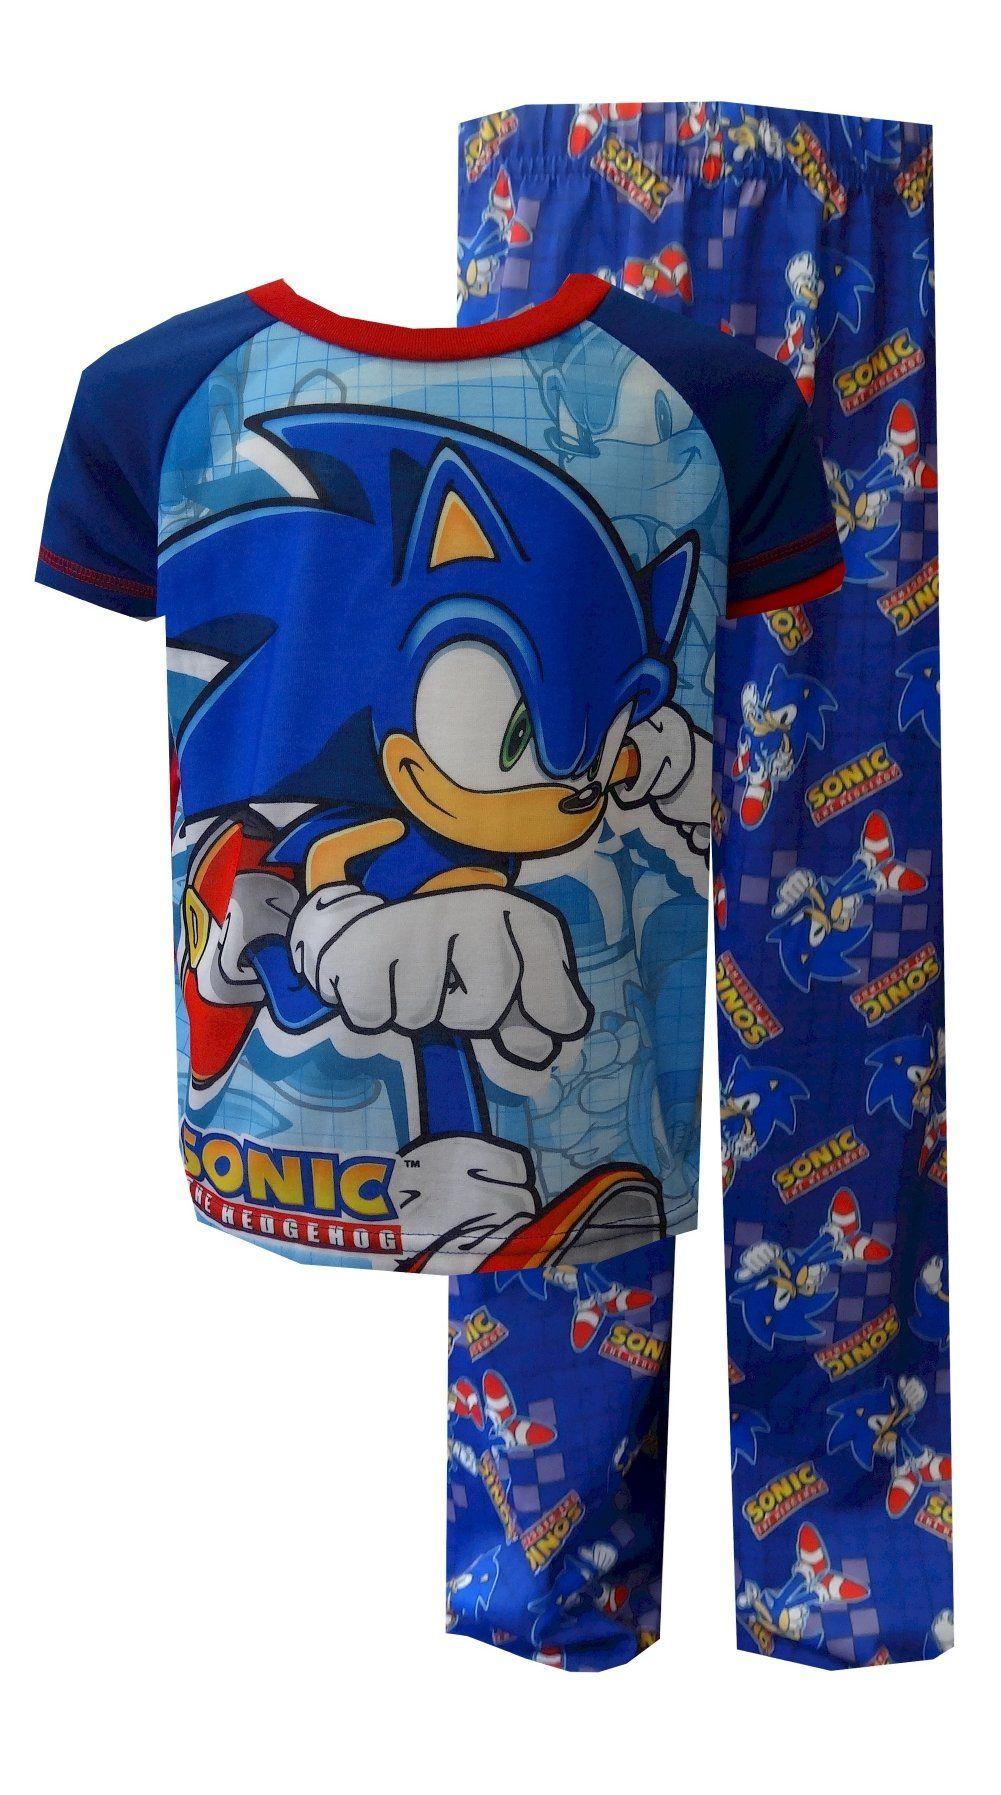 Sonic The Hedgehog On The Run Pajamas Sonic Costume Sonic Sonic Birthday